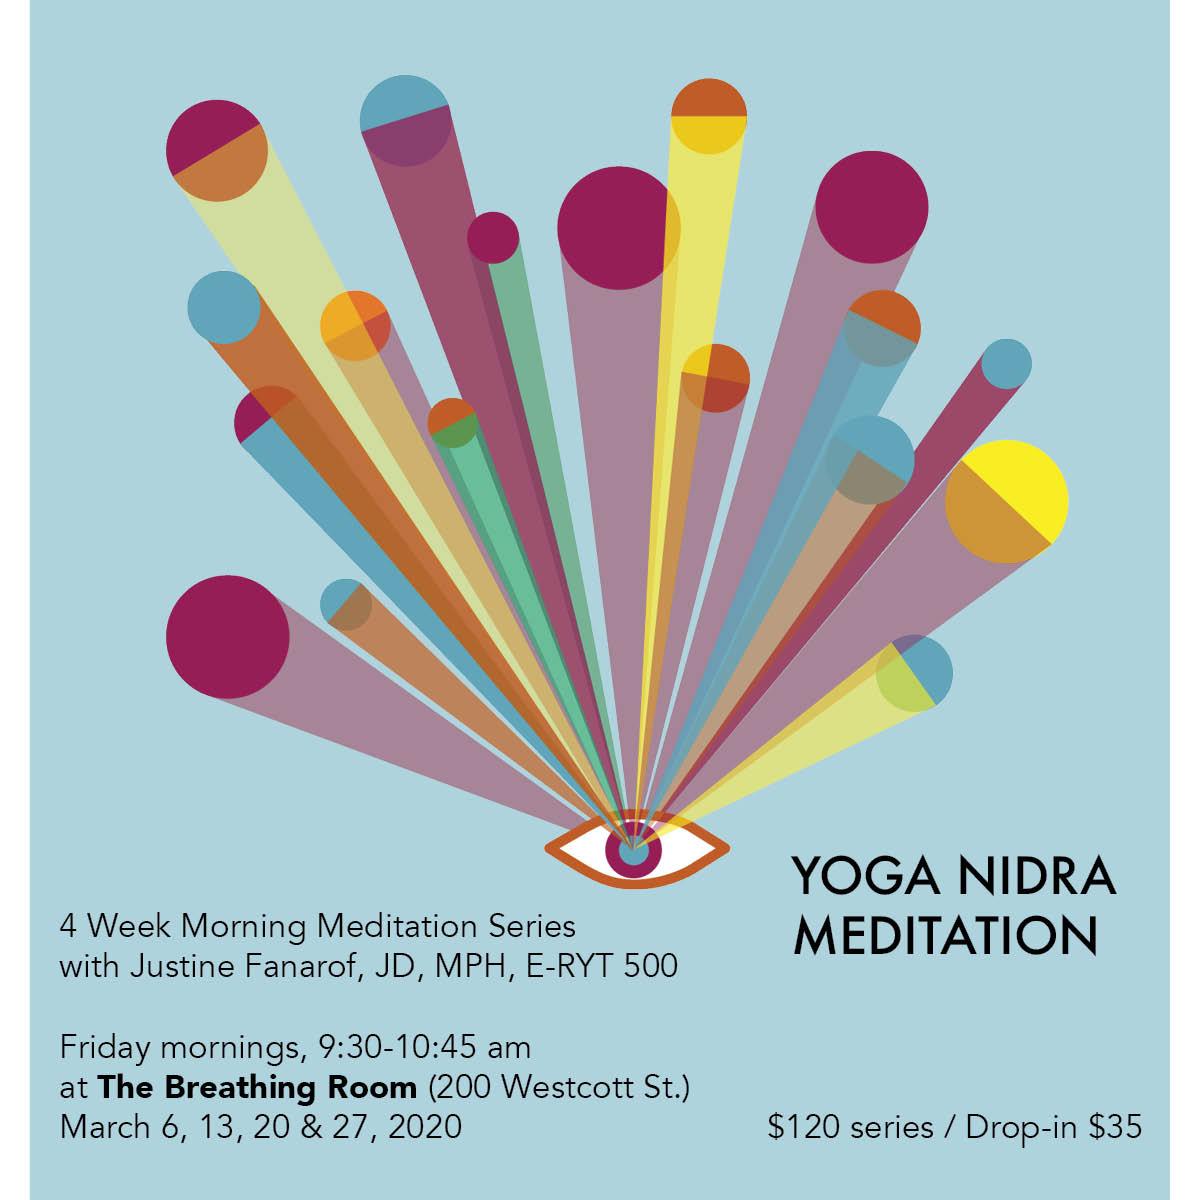 Yoga Nidra Mediation Houston Relaxation Creativity Breathe Breath The Breathing Room Justine Fanarof Meditation